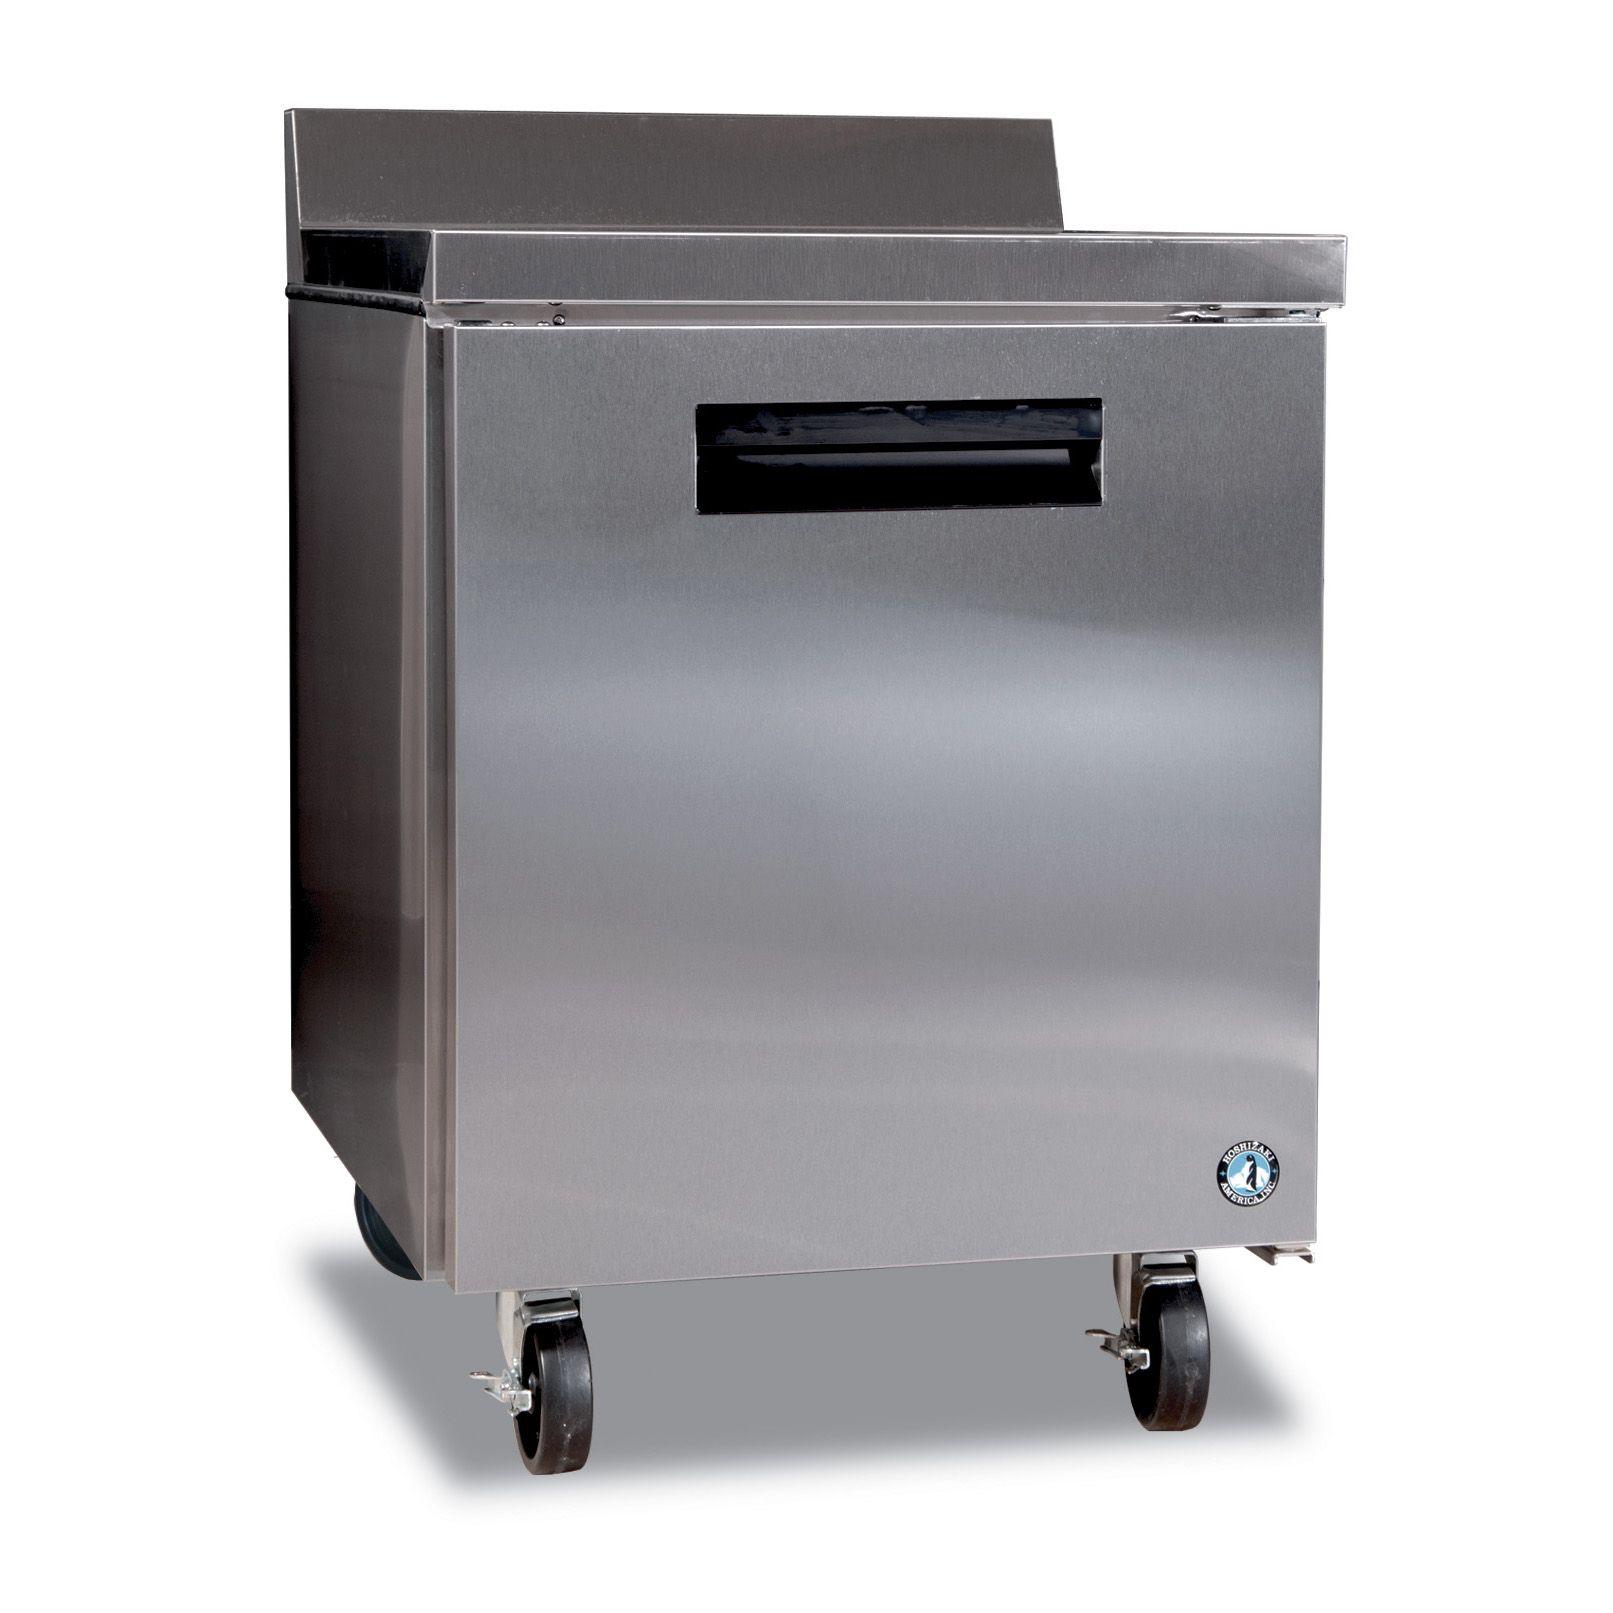 Hoshizaki CRMR27W Work tops, Refrigerator dimensions